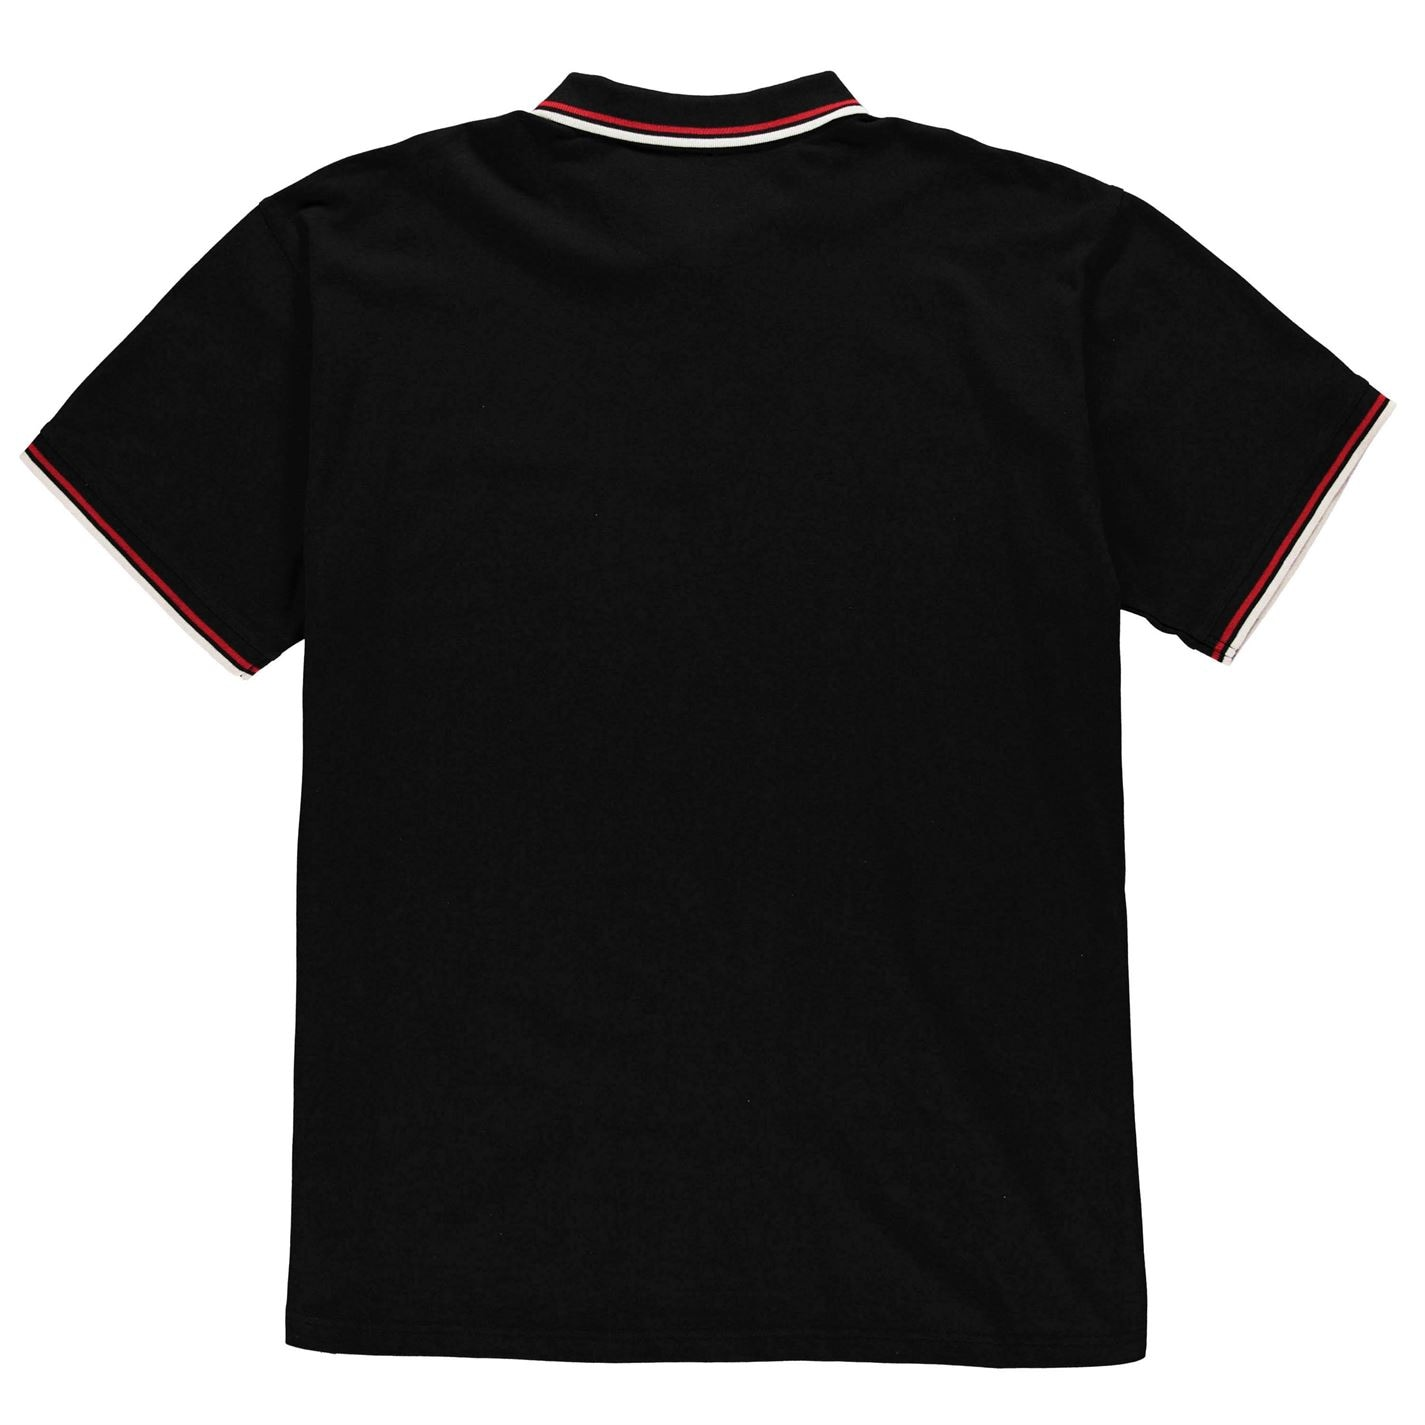 Tricouri Polo Pierre Cardin XL Tipped pentru Barbati negru